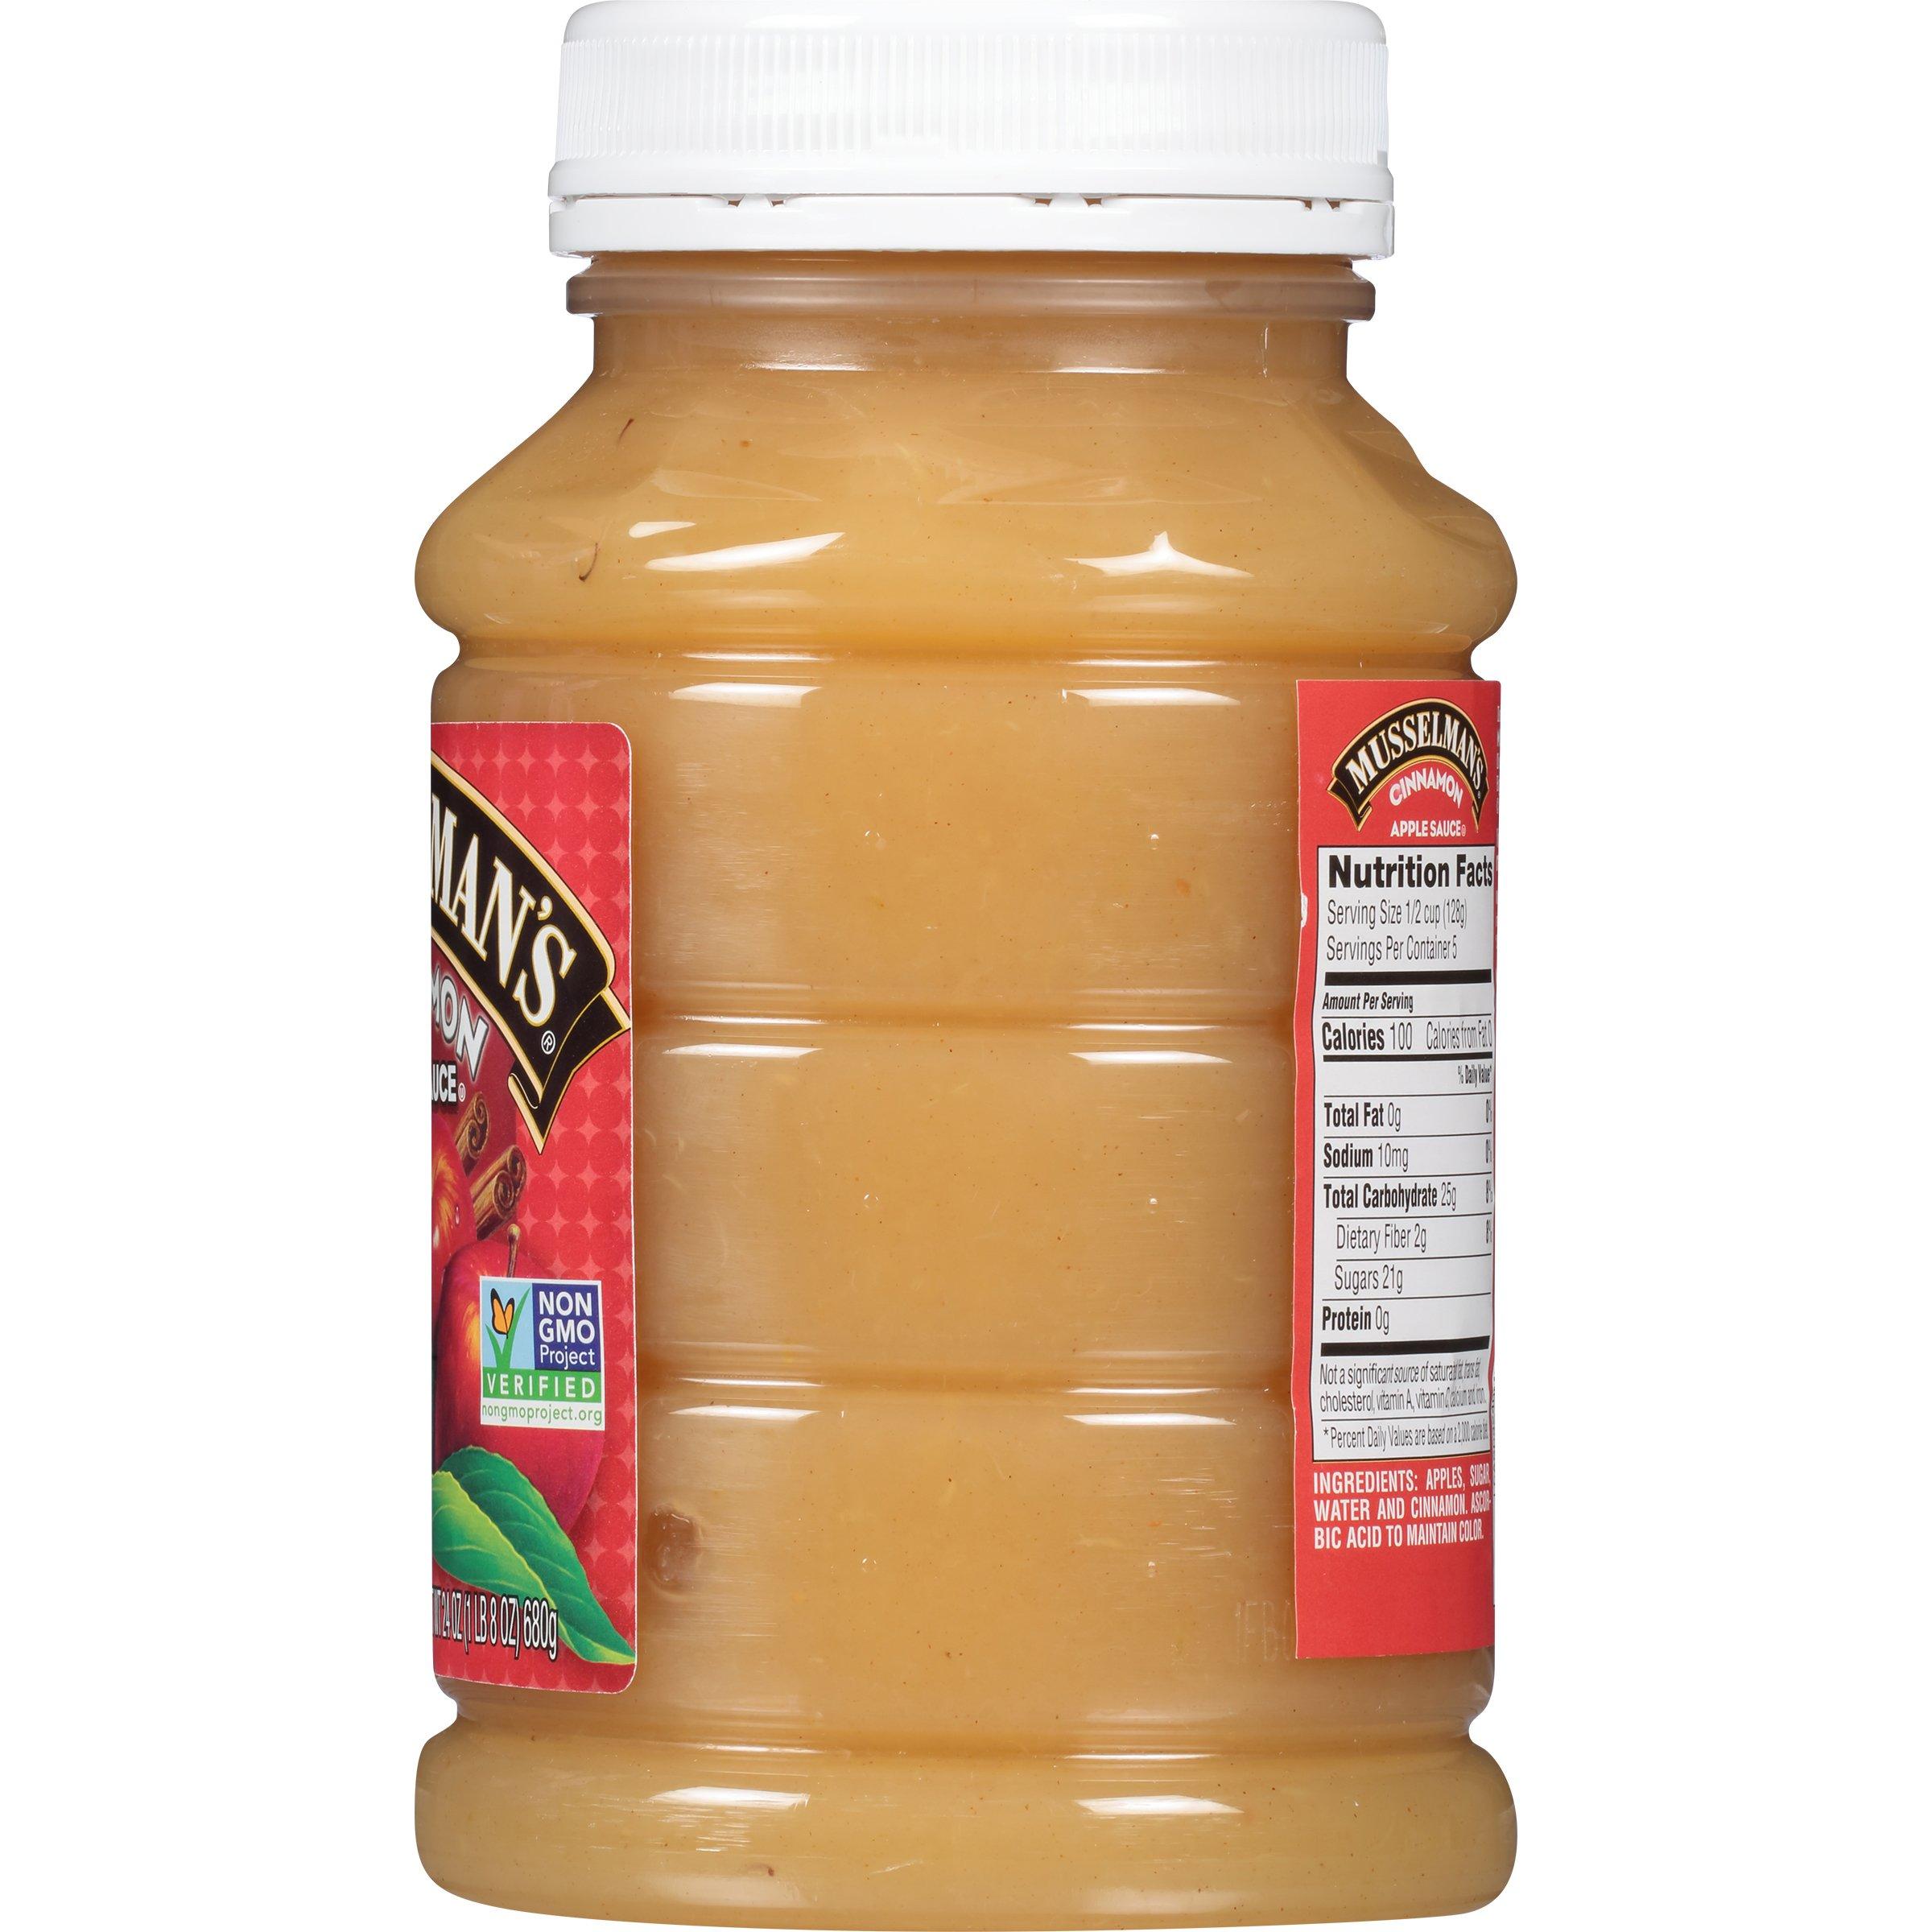 Musselman's Cinnamon Apple Sauce, 24 Ounce (Pack of 12) by Musselmans (Image #4)